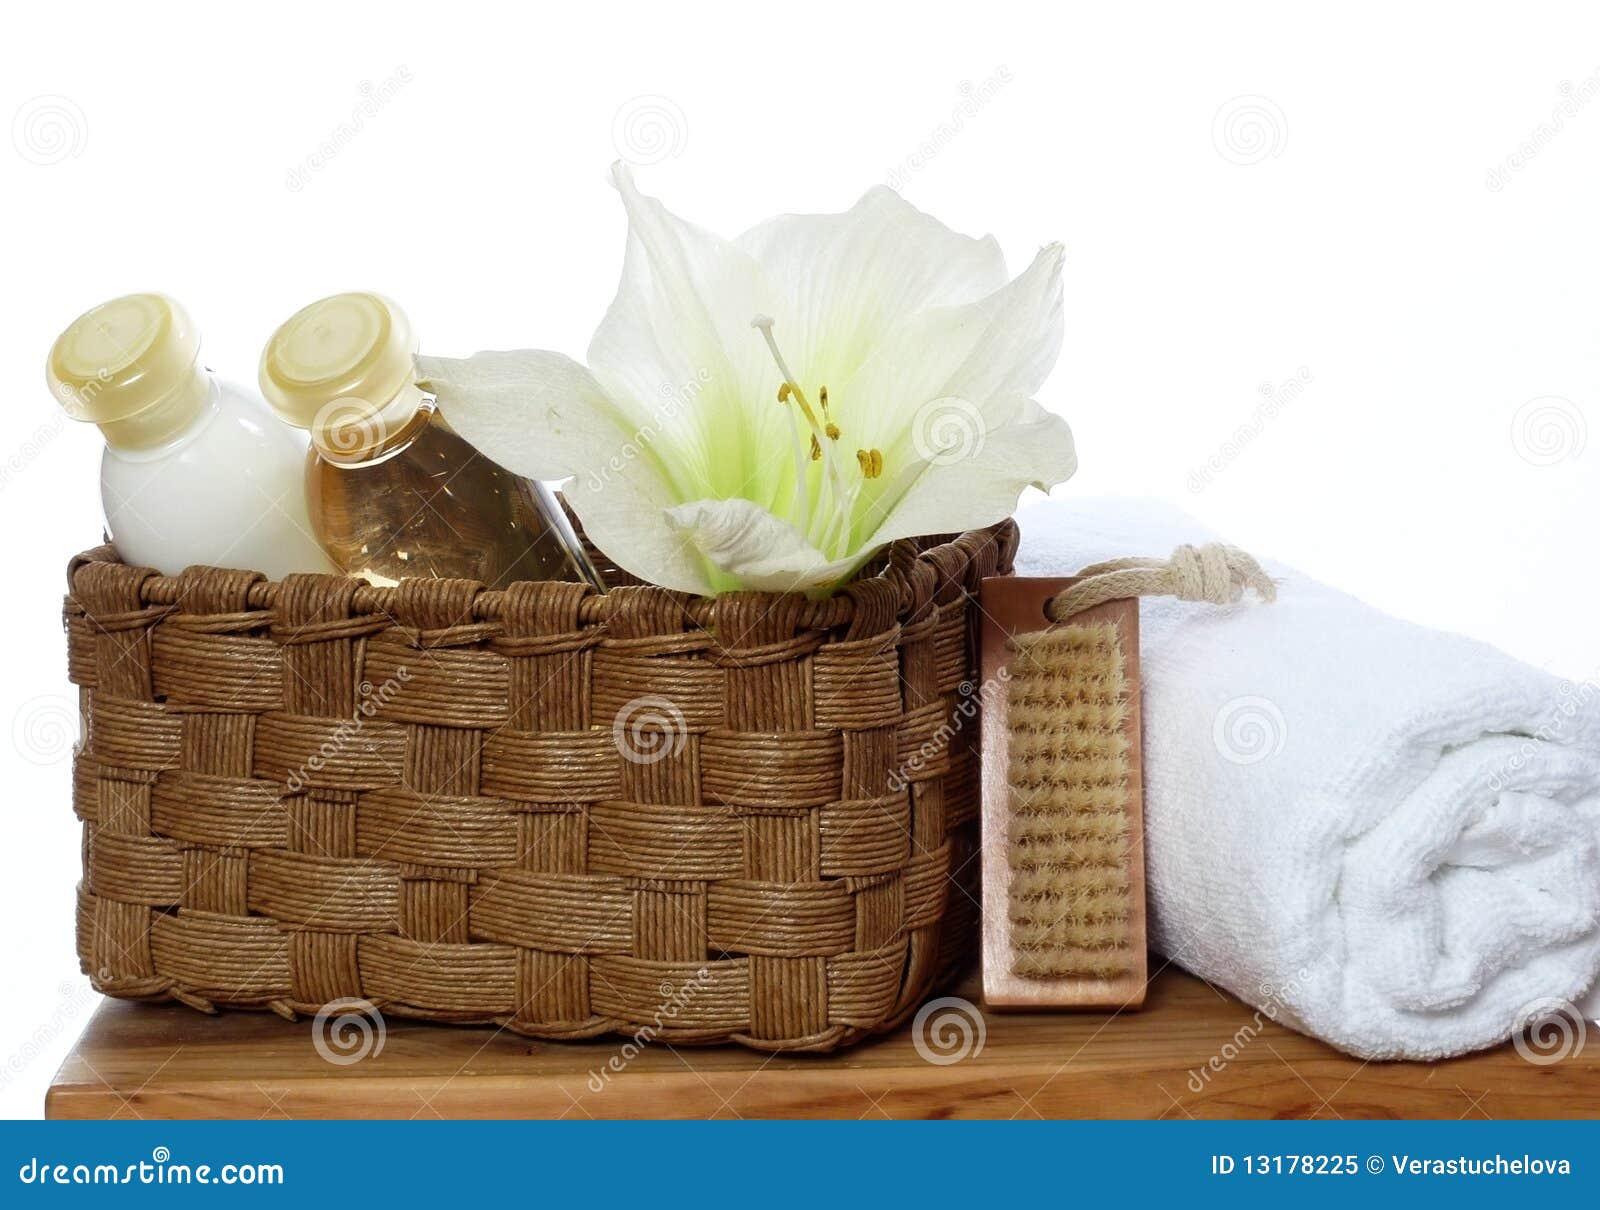 spa decoration item stock photo - image: 78780092